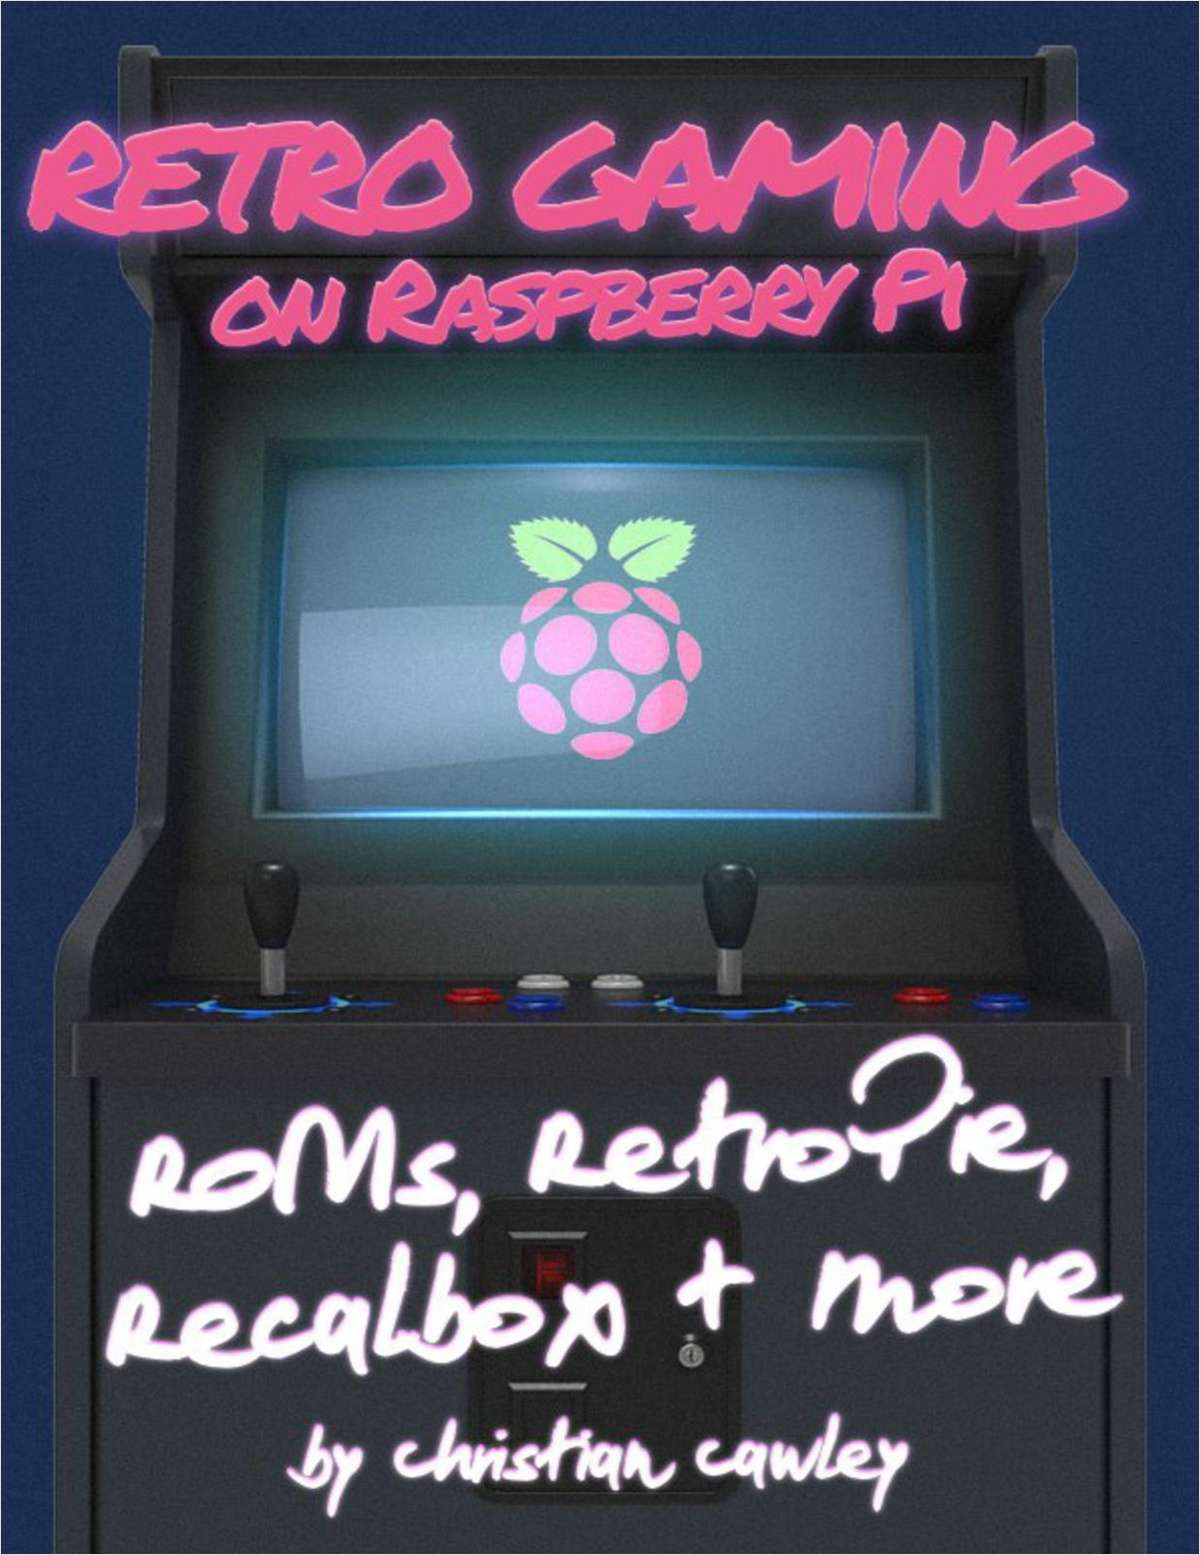 Retro Gaming on Raspberry Pi Screenshot